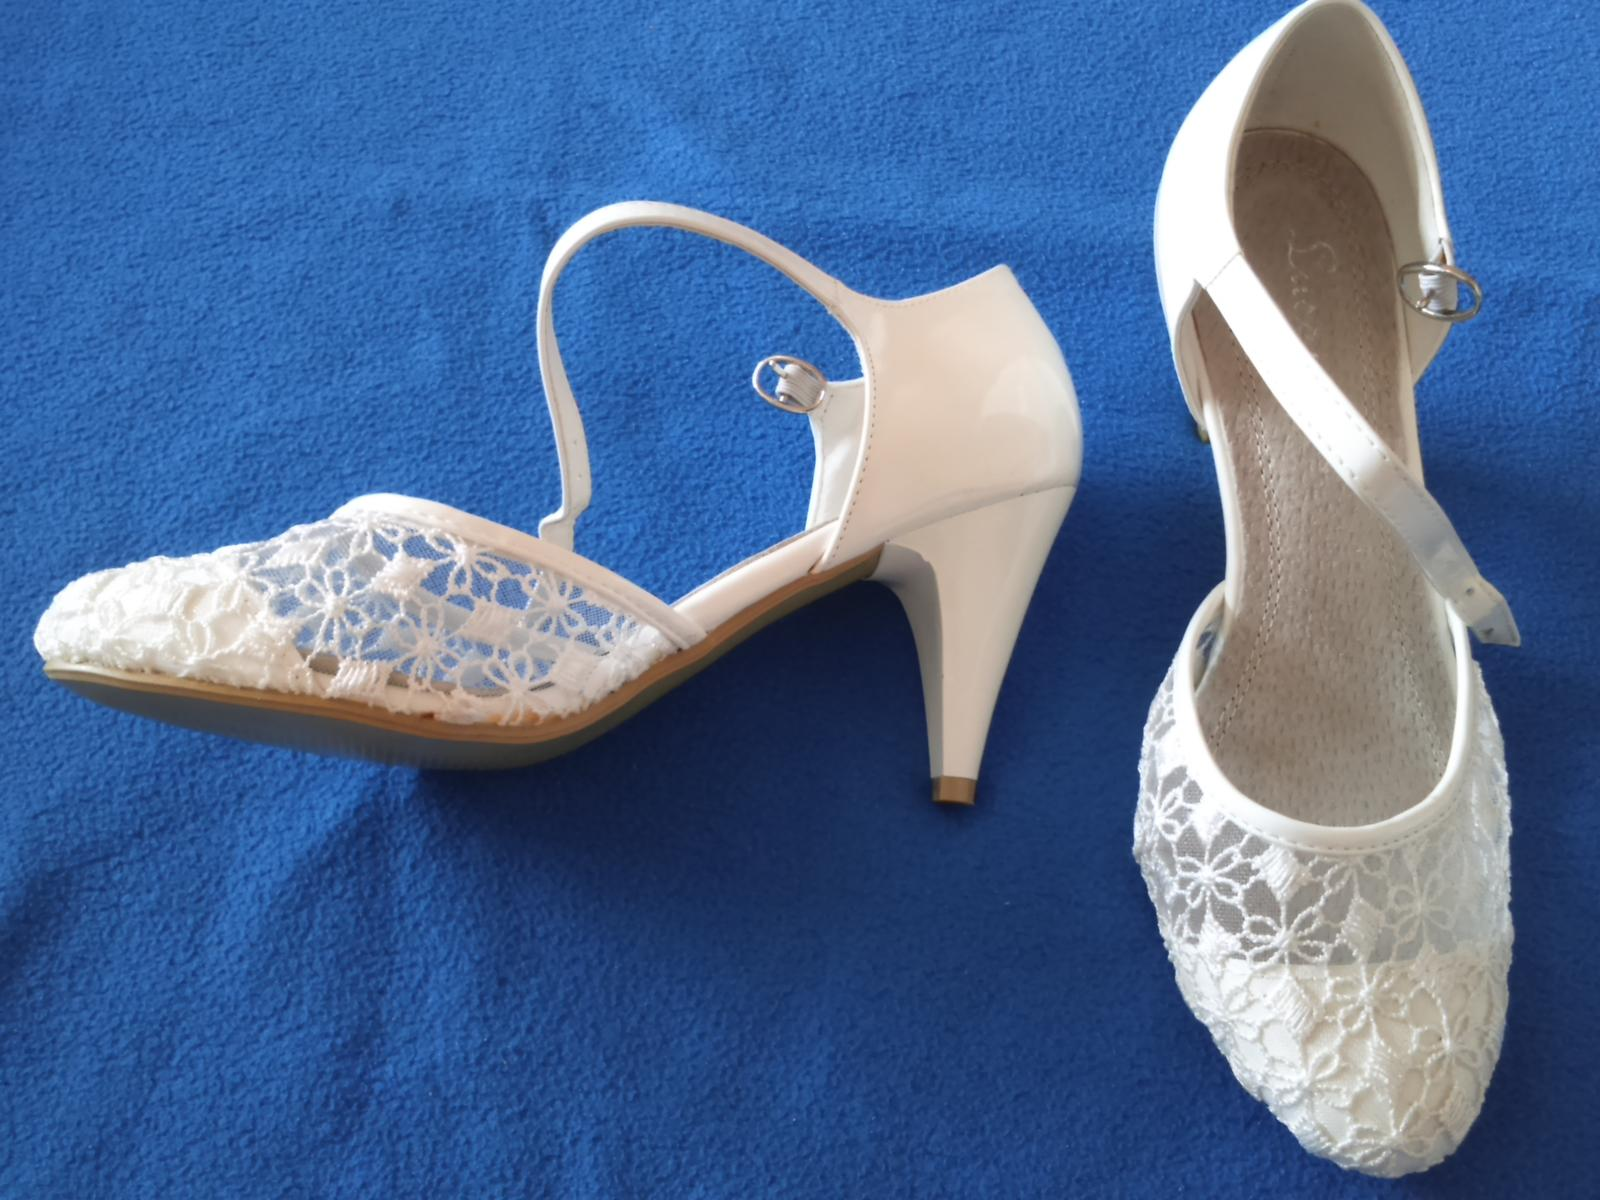 Biele sandálky - Obrázok č. 1